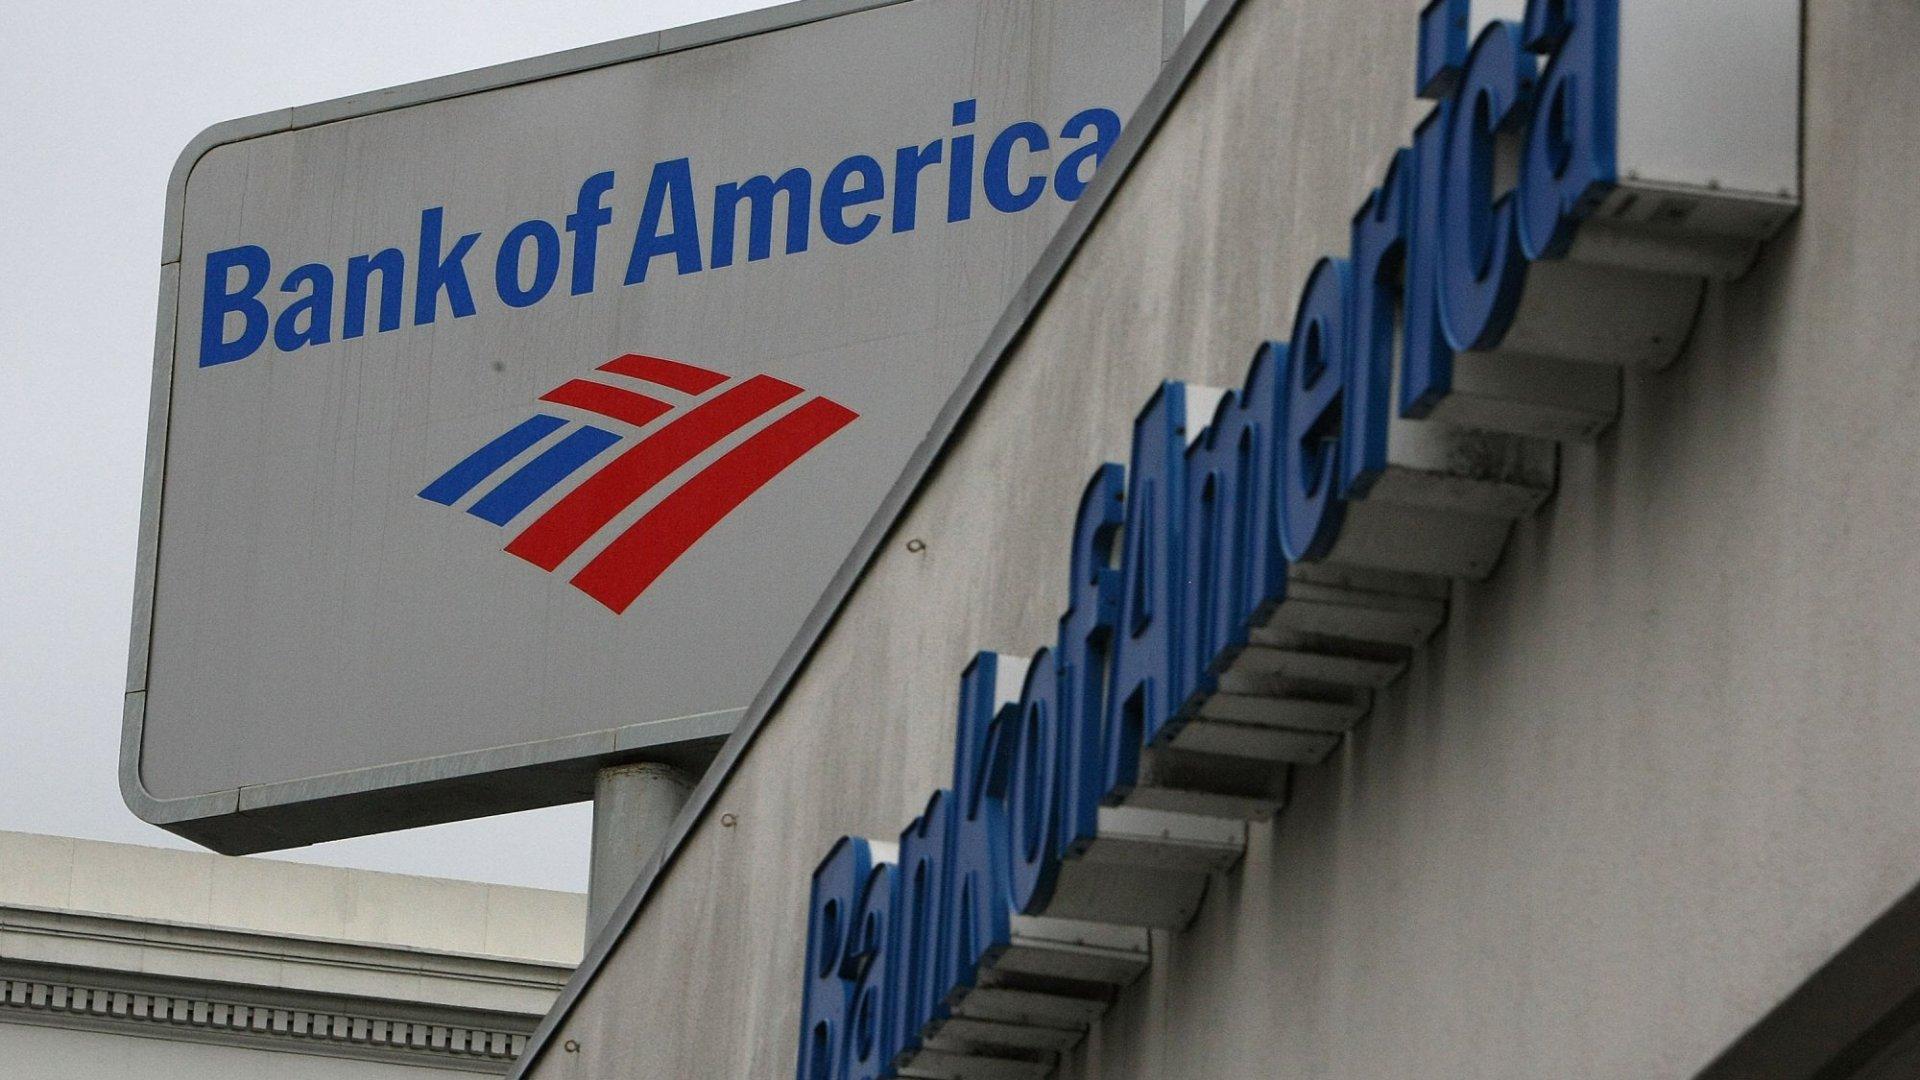 Bank of America Prunes Its Brand Portfolio